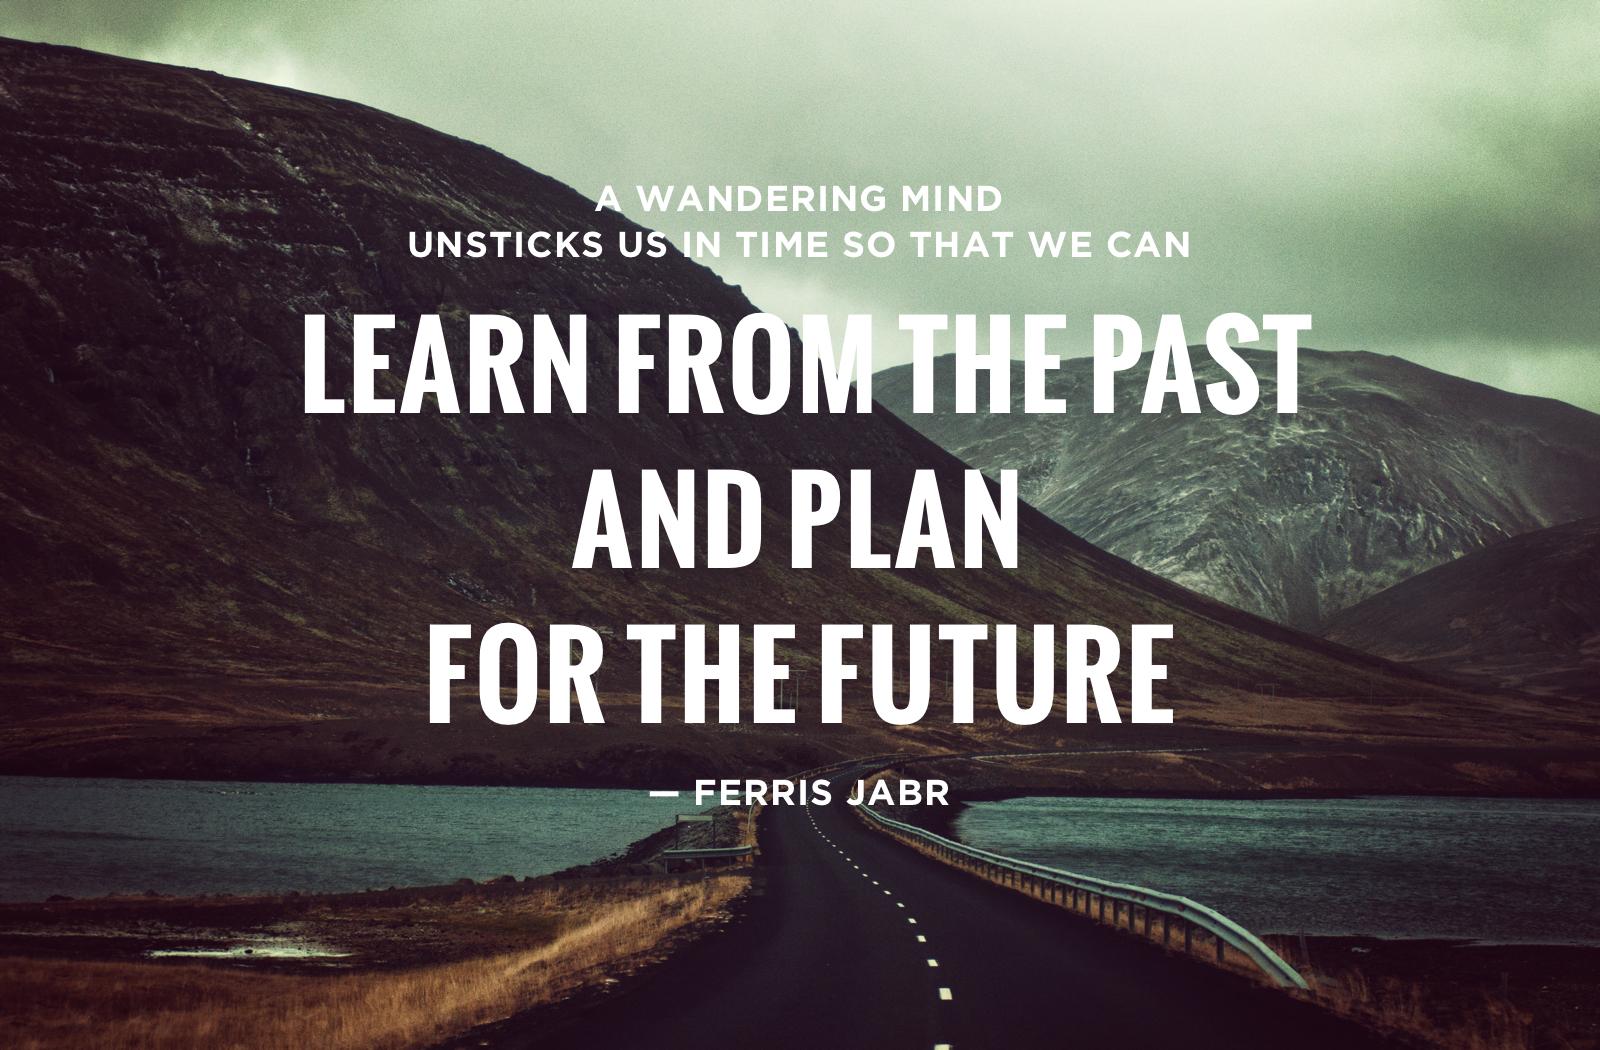 Ferris Jabr - Wandering Mind